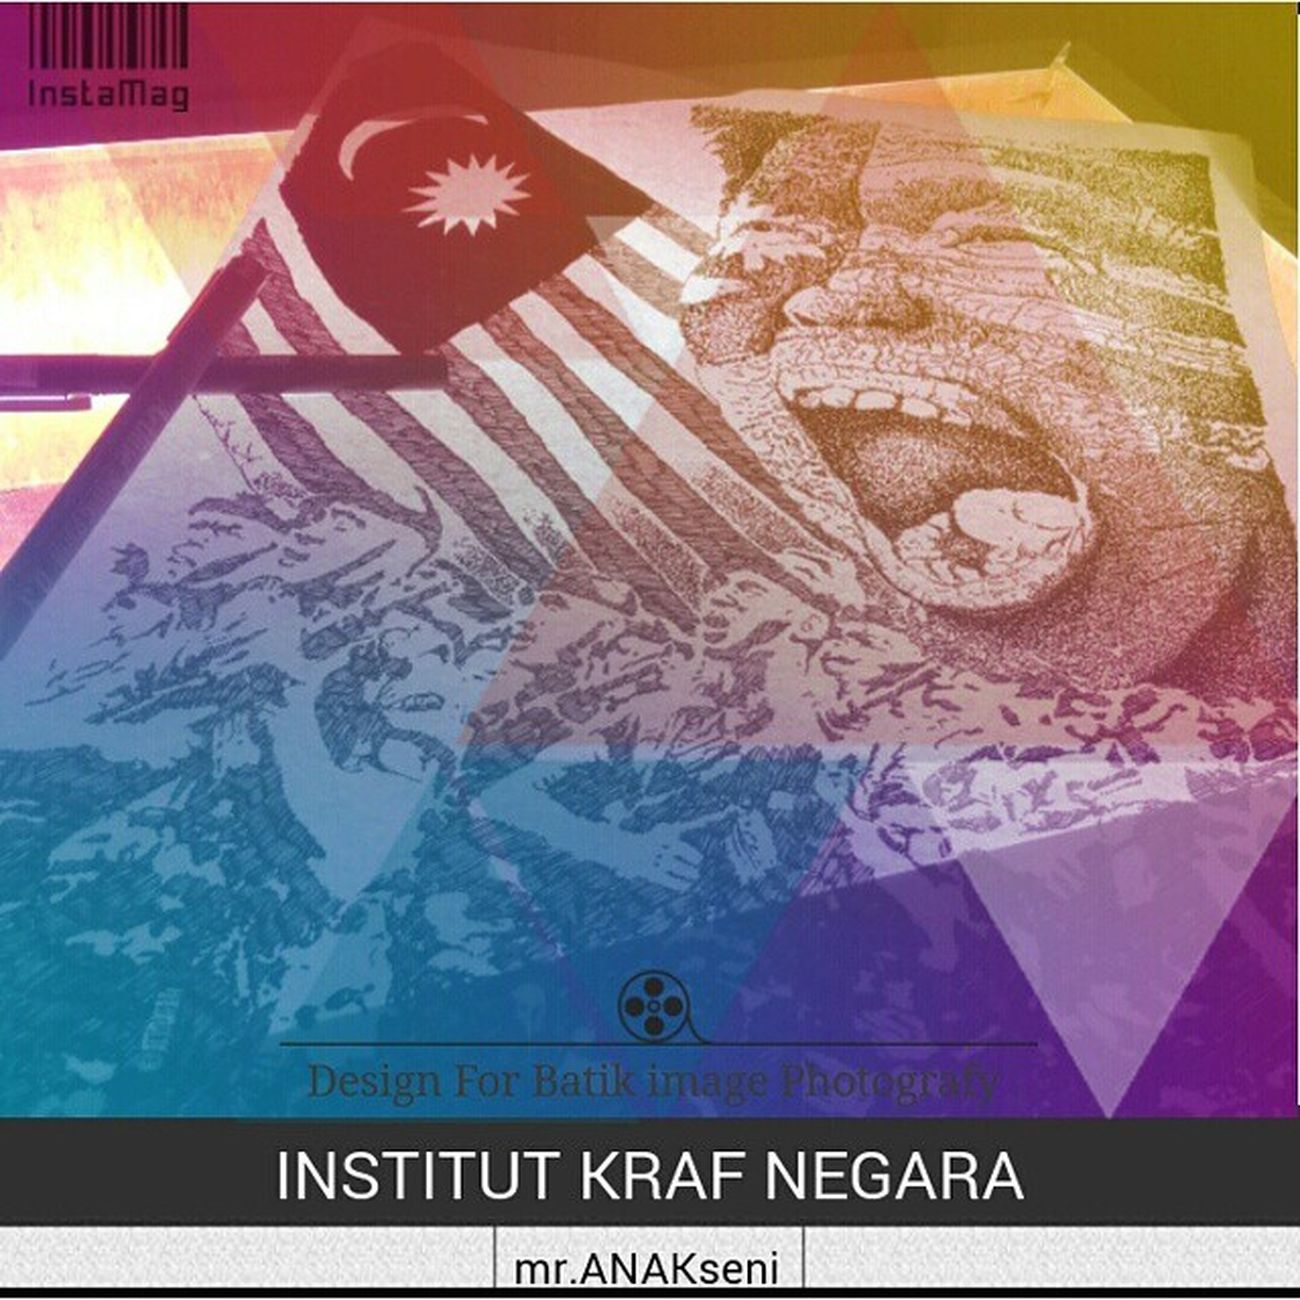 Design utk projek batik imej photografi esok.. InstitutKrafNegara Kraftanganmalaysia Imstudents InstaMagAndroid Kemerdekaan 31ogos2014